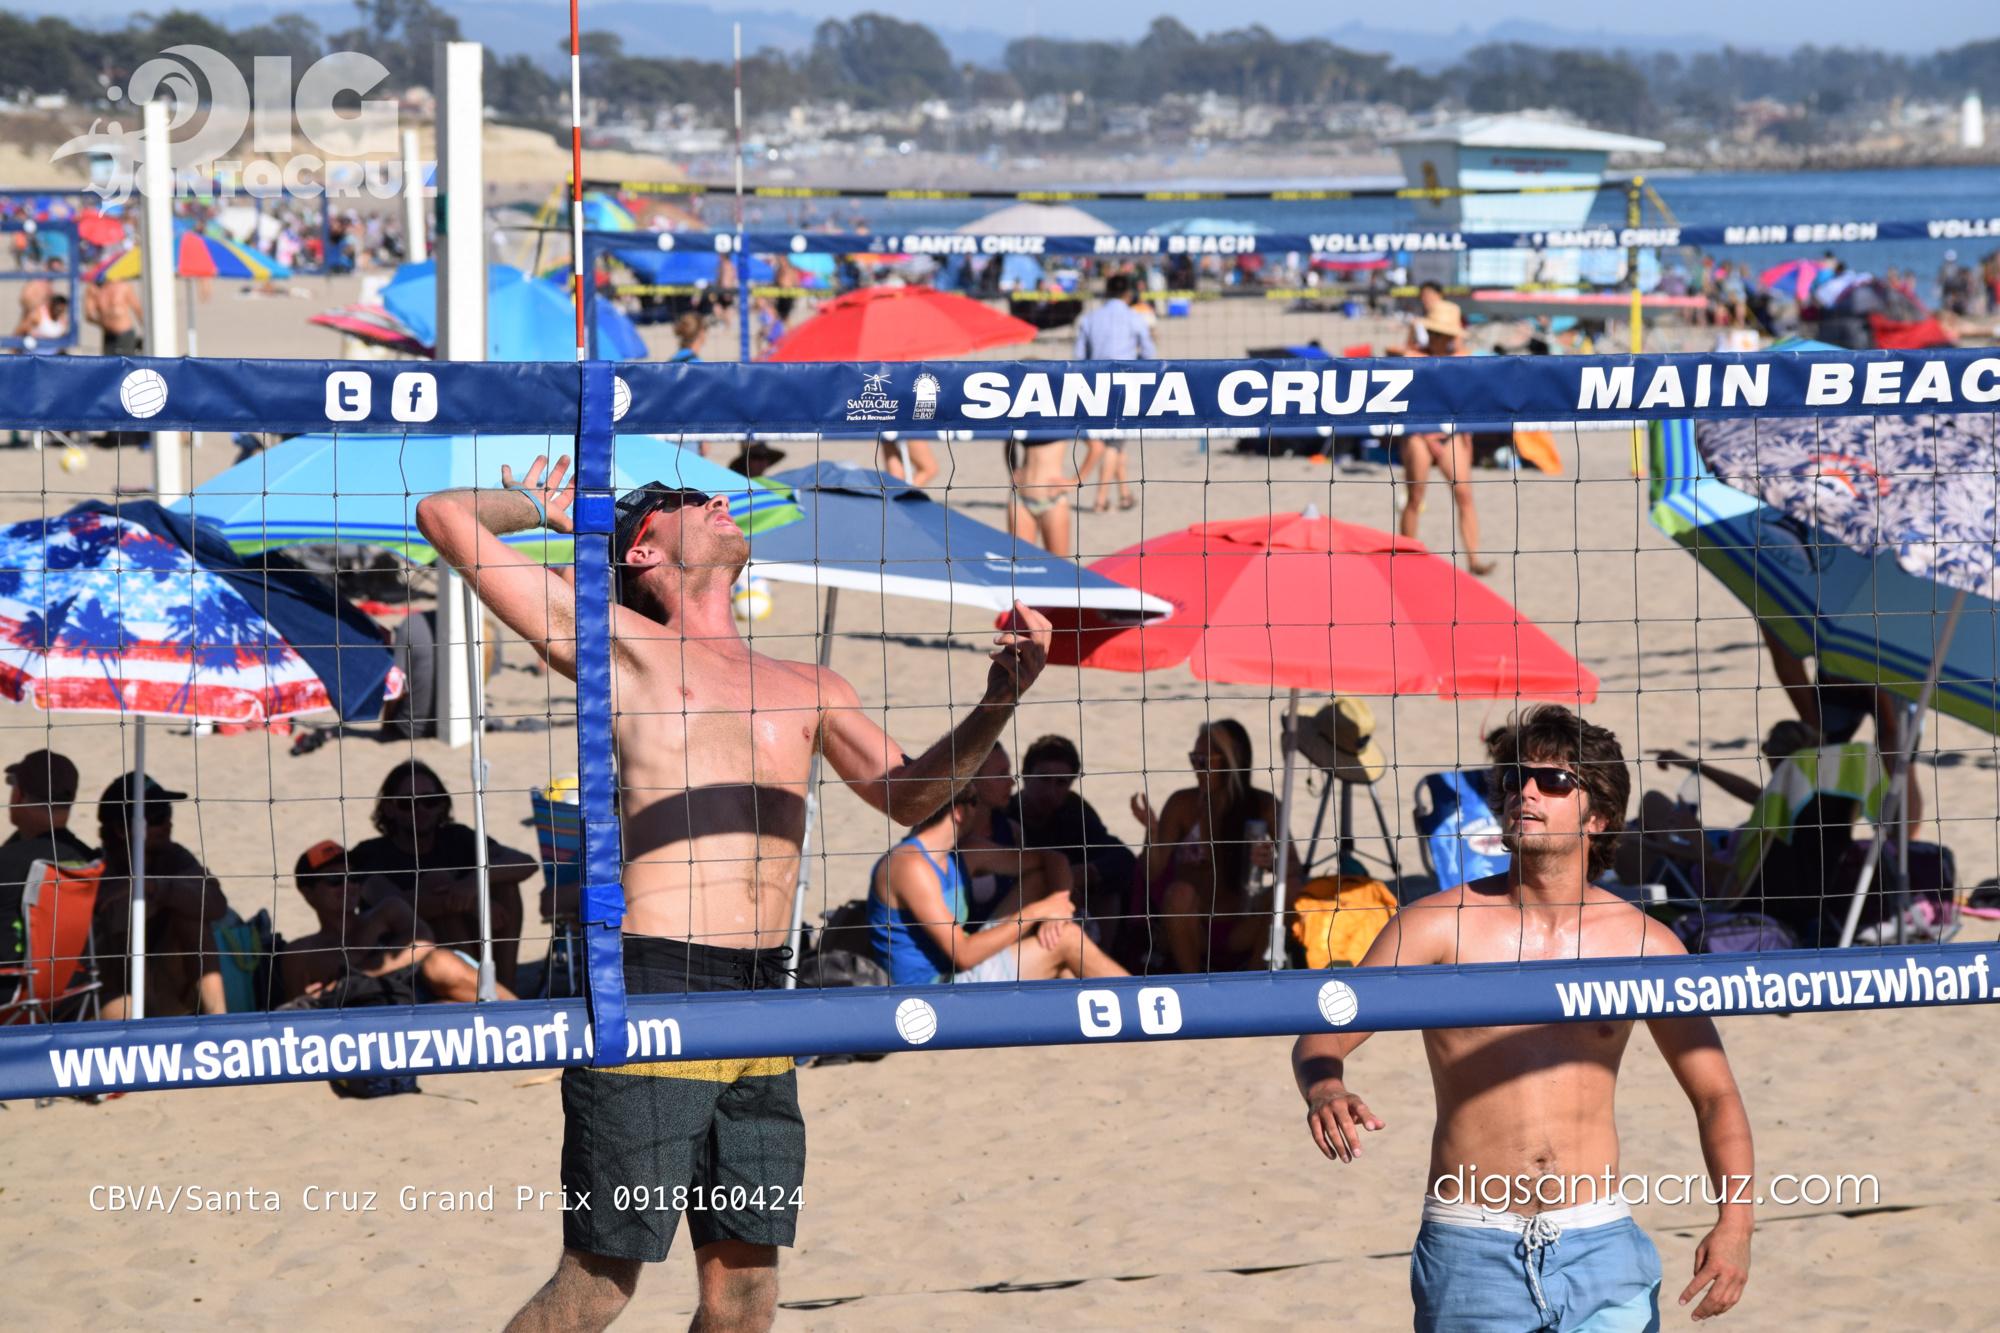 9.18.16 Santa Cruz Grand Prix 424.jpg